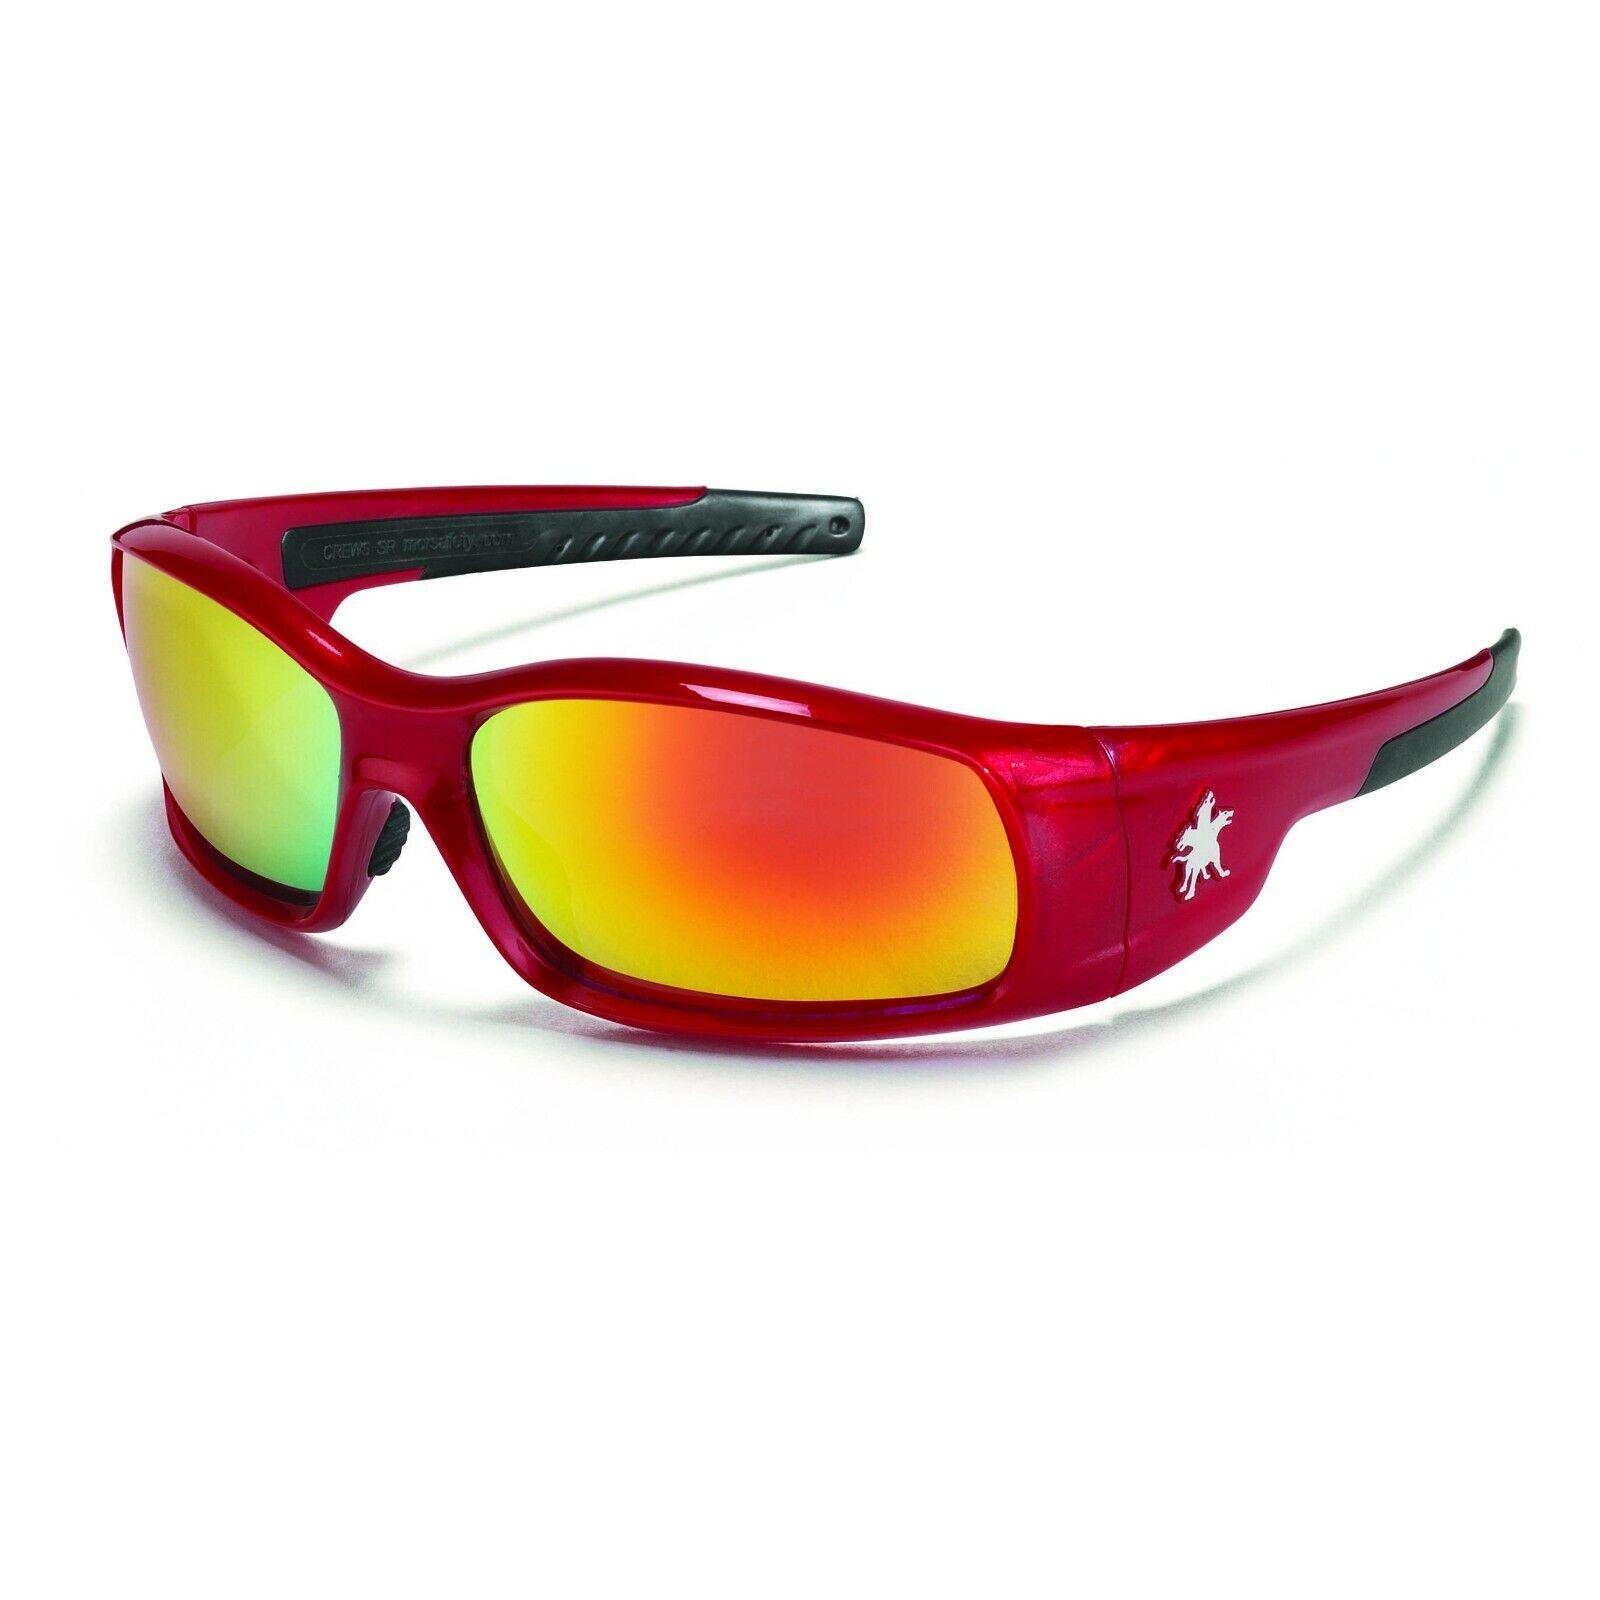 MCR Safety/Crews SR13R Red Frame – Red/Orange Mirror Safety Glasses Business & Industrial